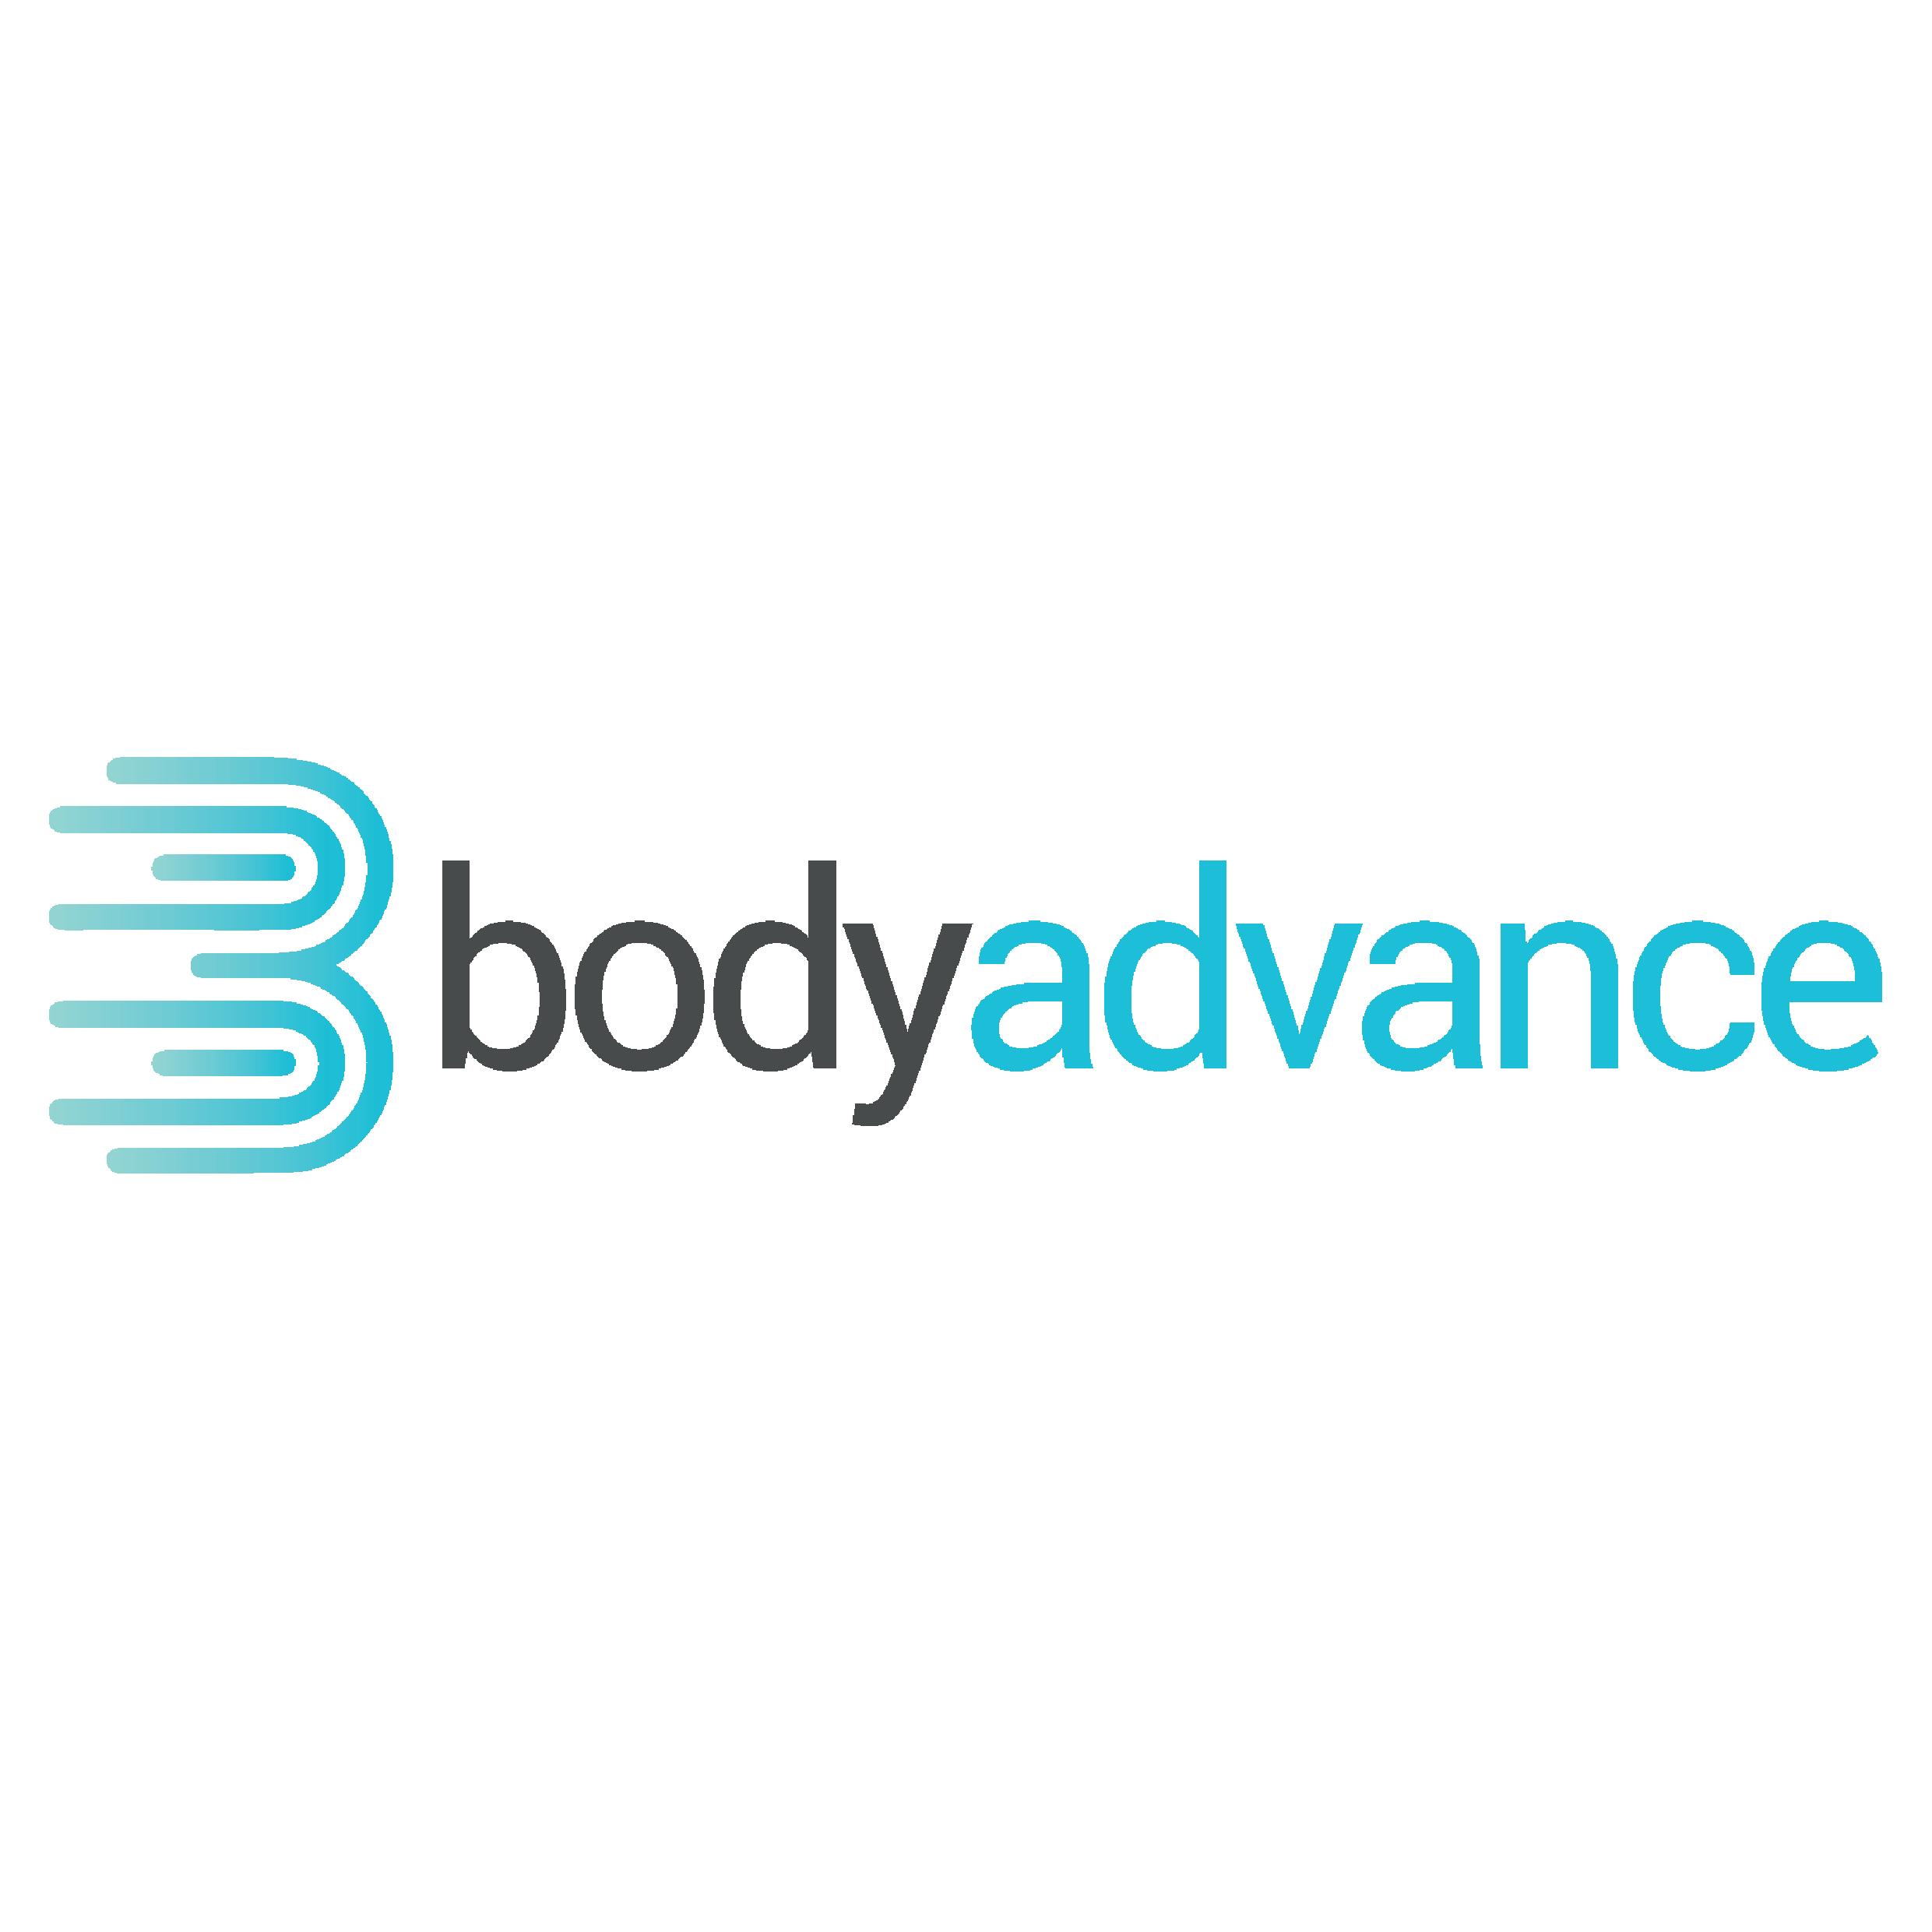 Body Advance